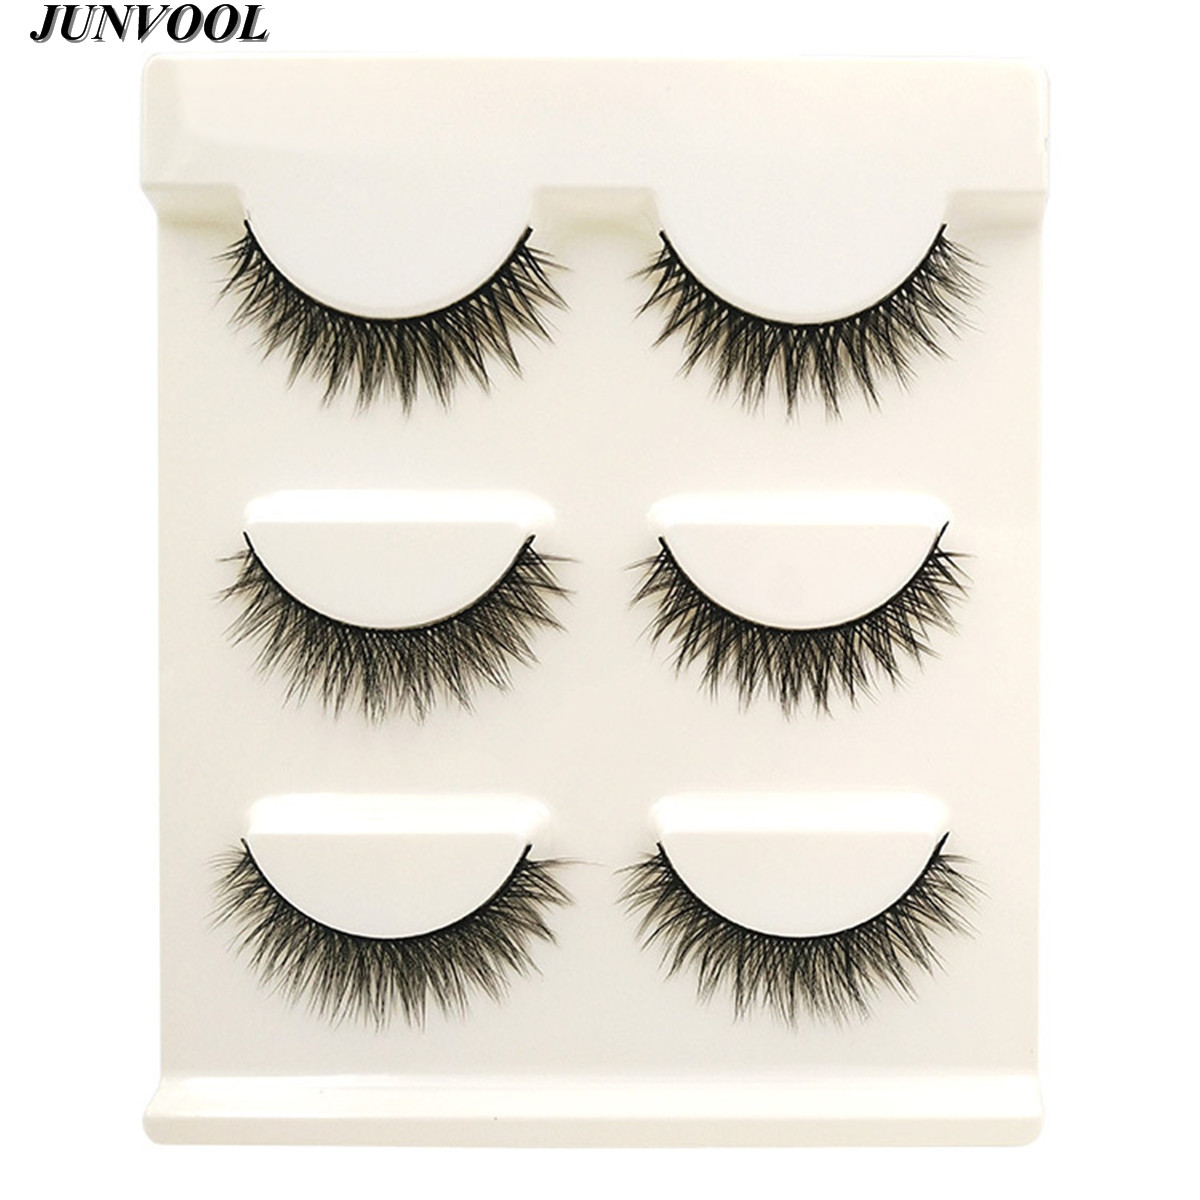 Ekstensi bulu mata, 15 Pairs buatan tangan 3D Mink rambut, Kecantikan - Riasan - Foto 4